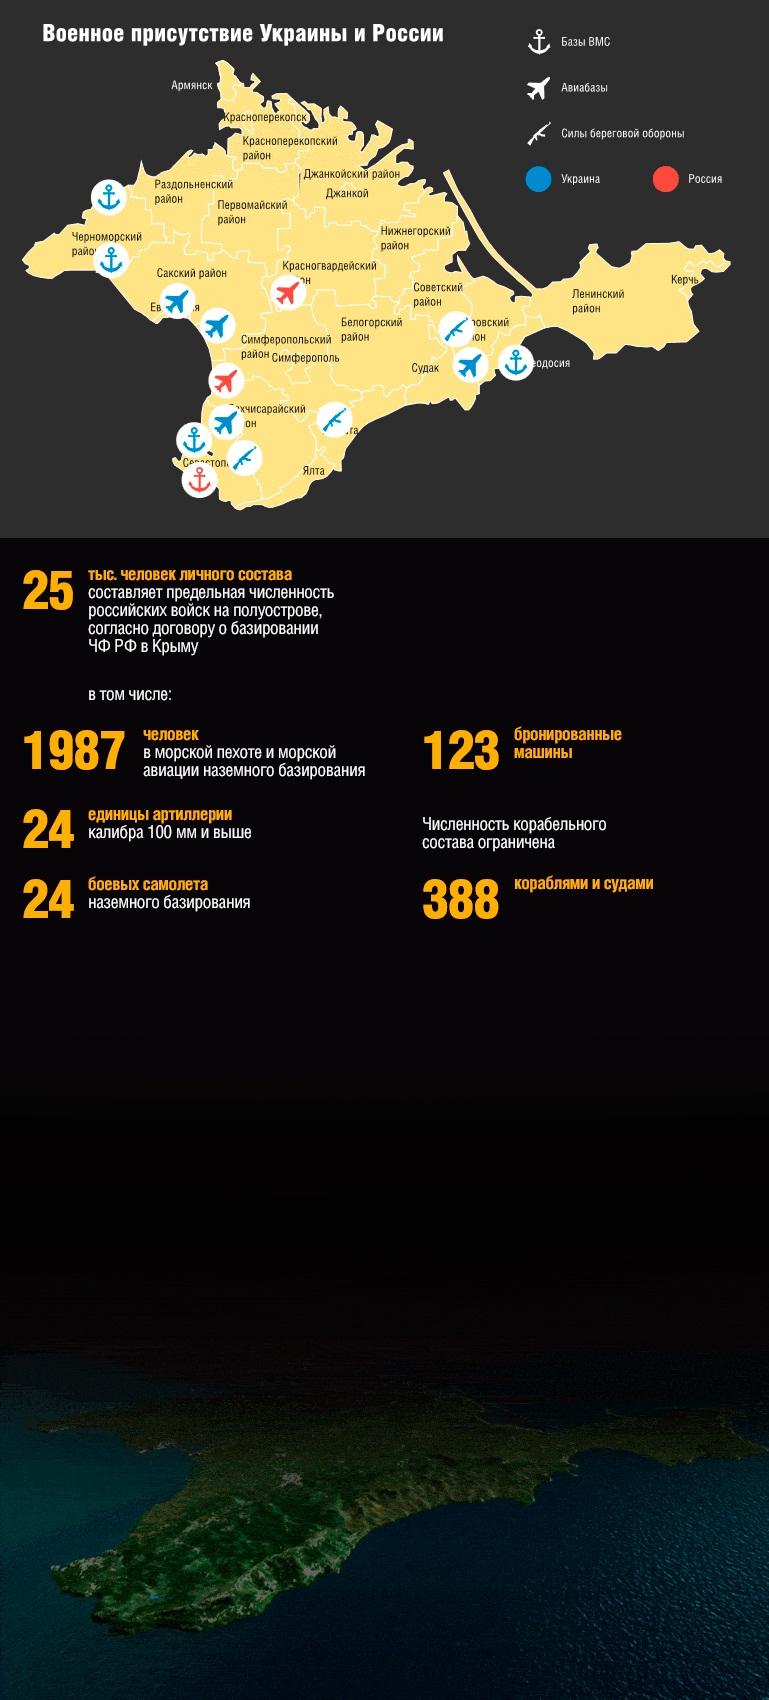 Crimea_map_data_2014_03_17_Kommersant_10_military_Ukraine_Russia_Kommersant